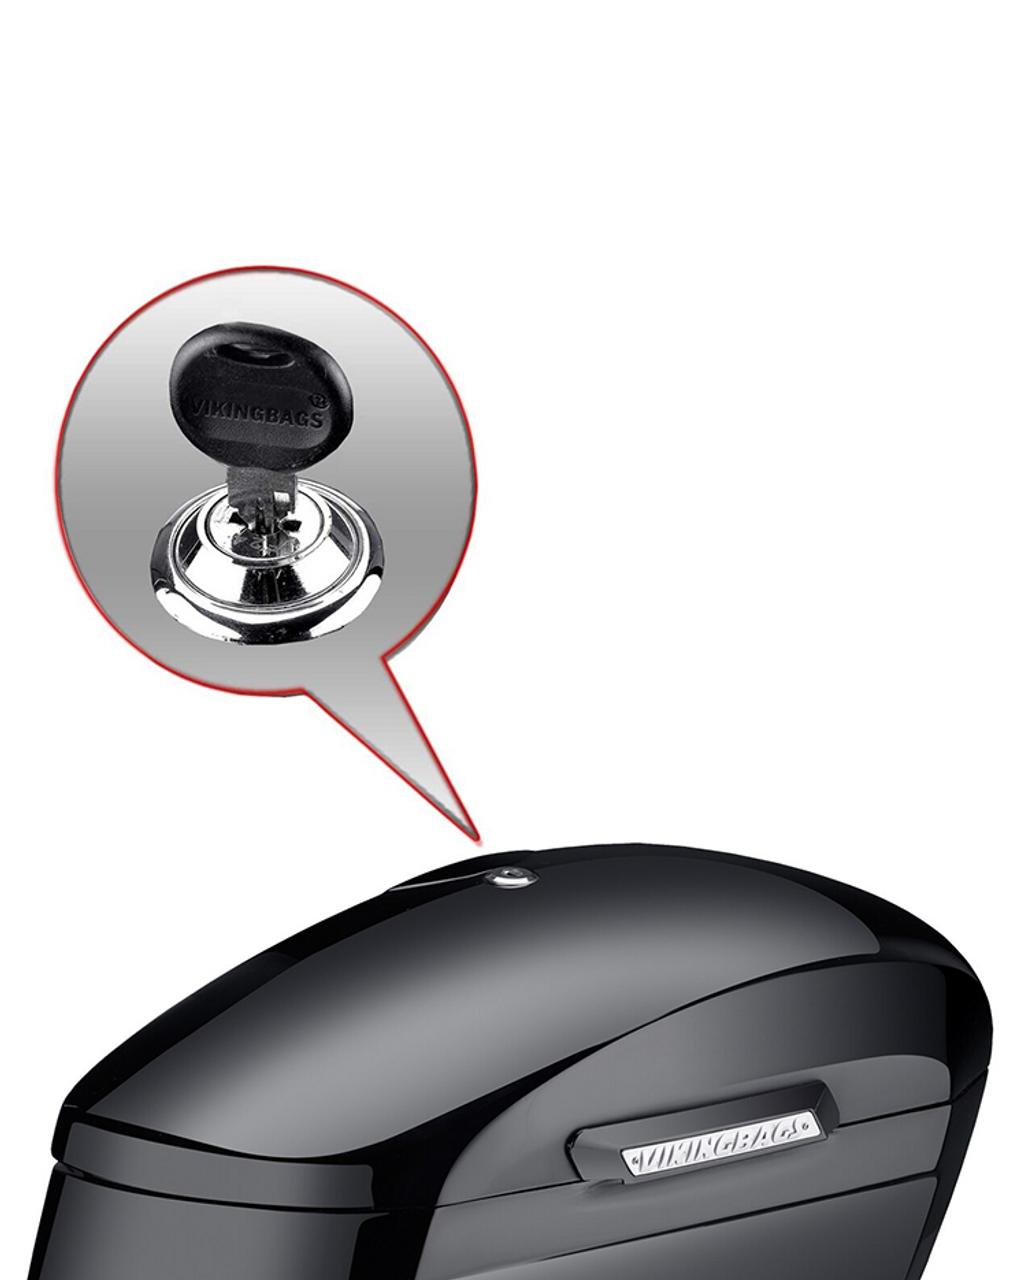 Honda VTX 1800 C Viking Lamellar Extra Large Shock Cutout Saddlebag lock key view